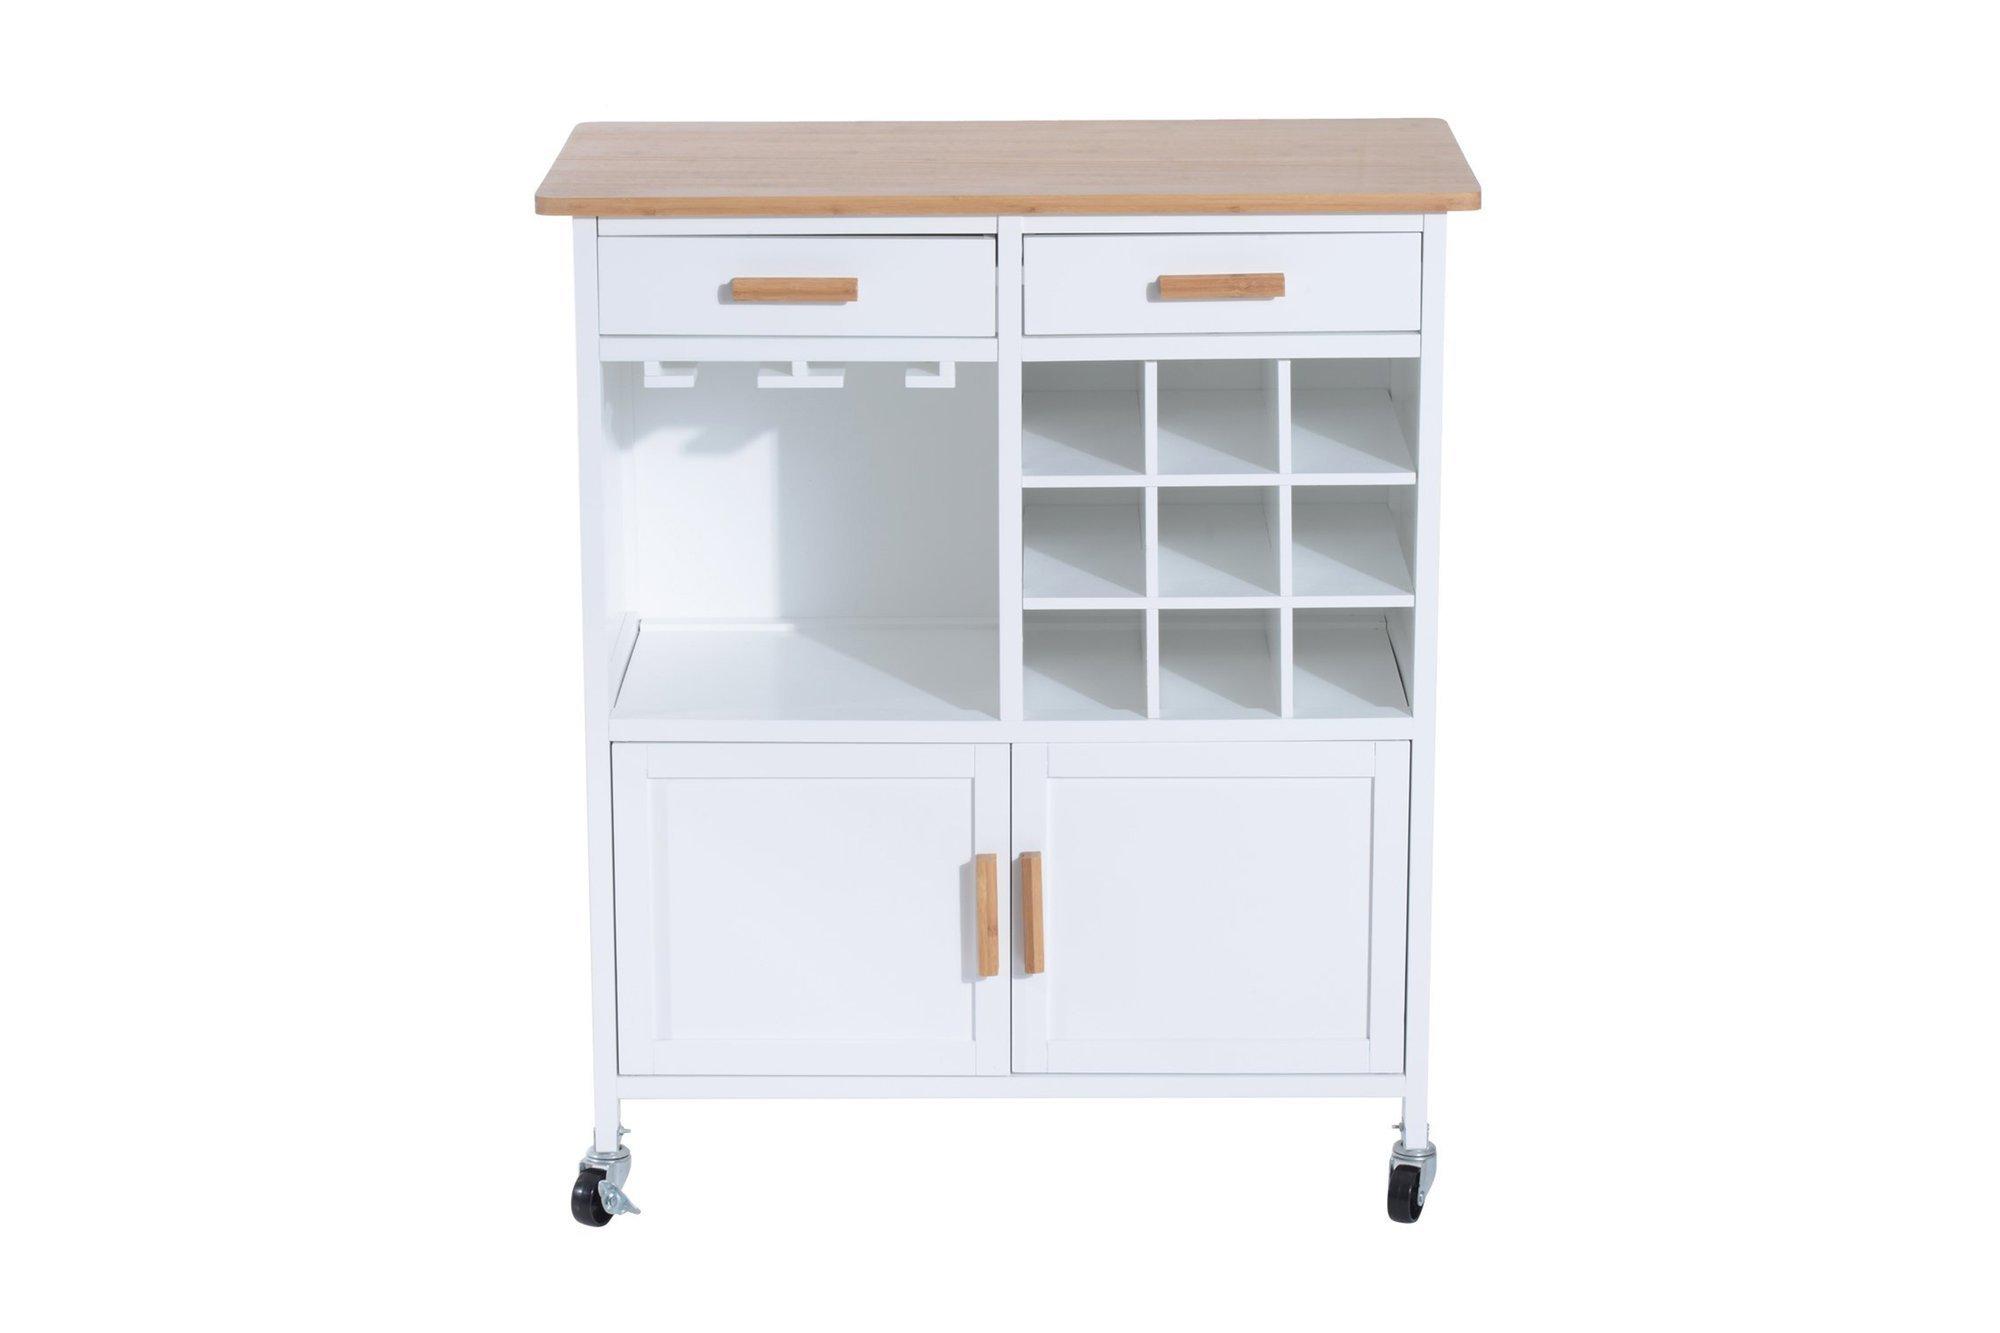 Trolley / Kitchen cabinet on wheels Homcom 801-008WT